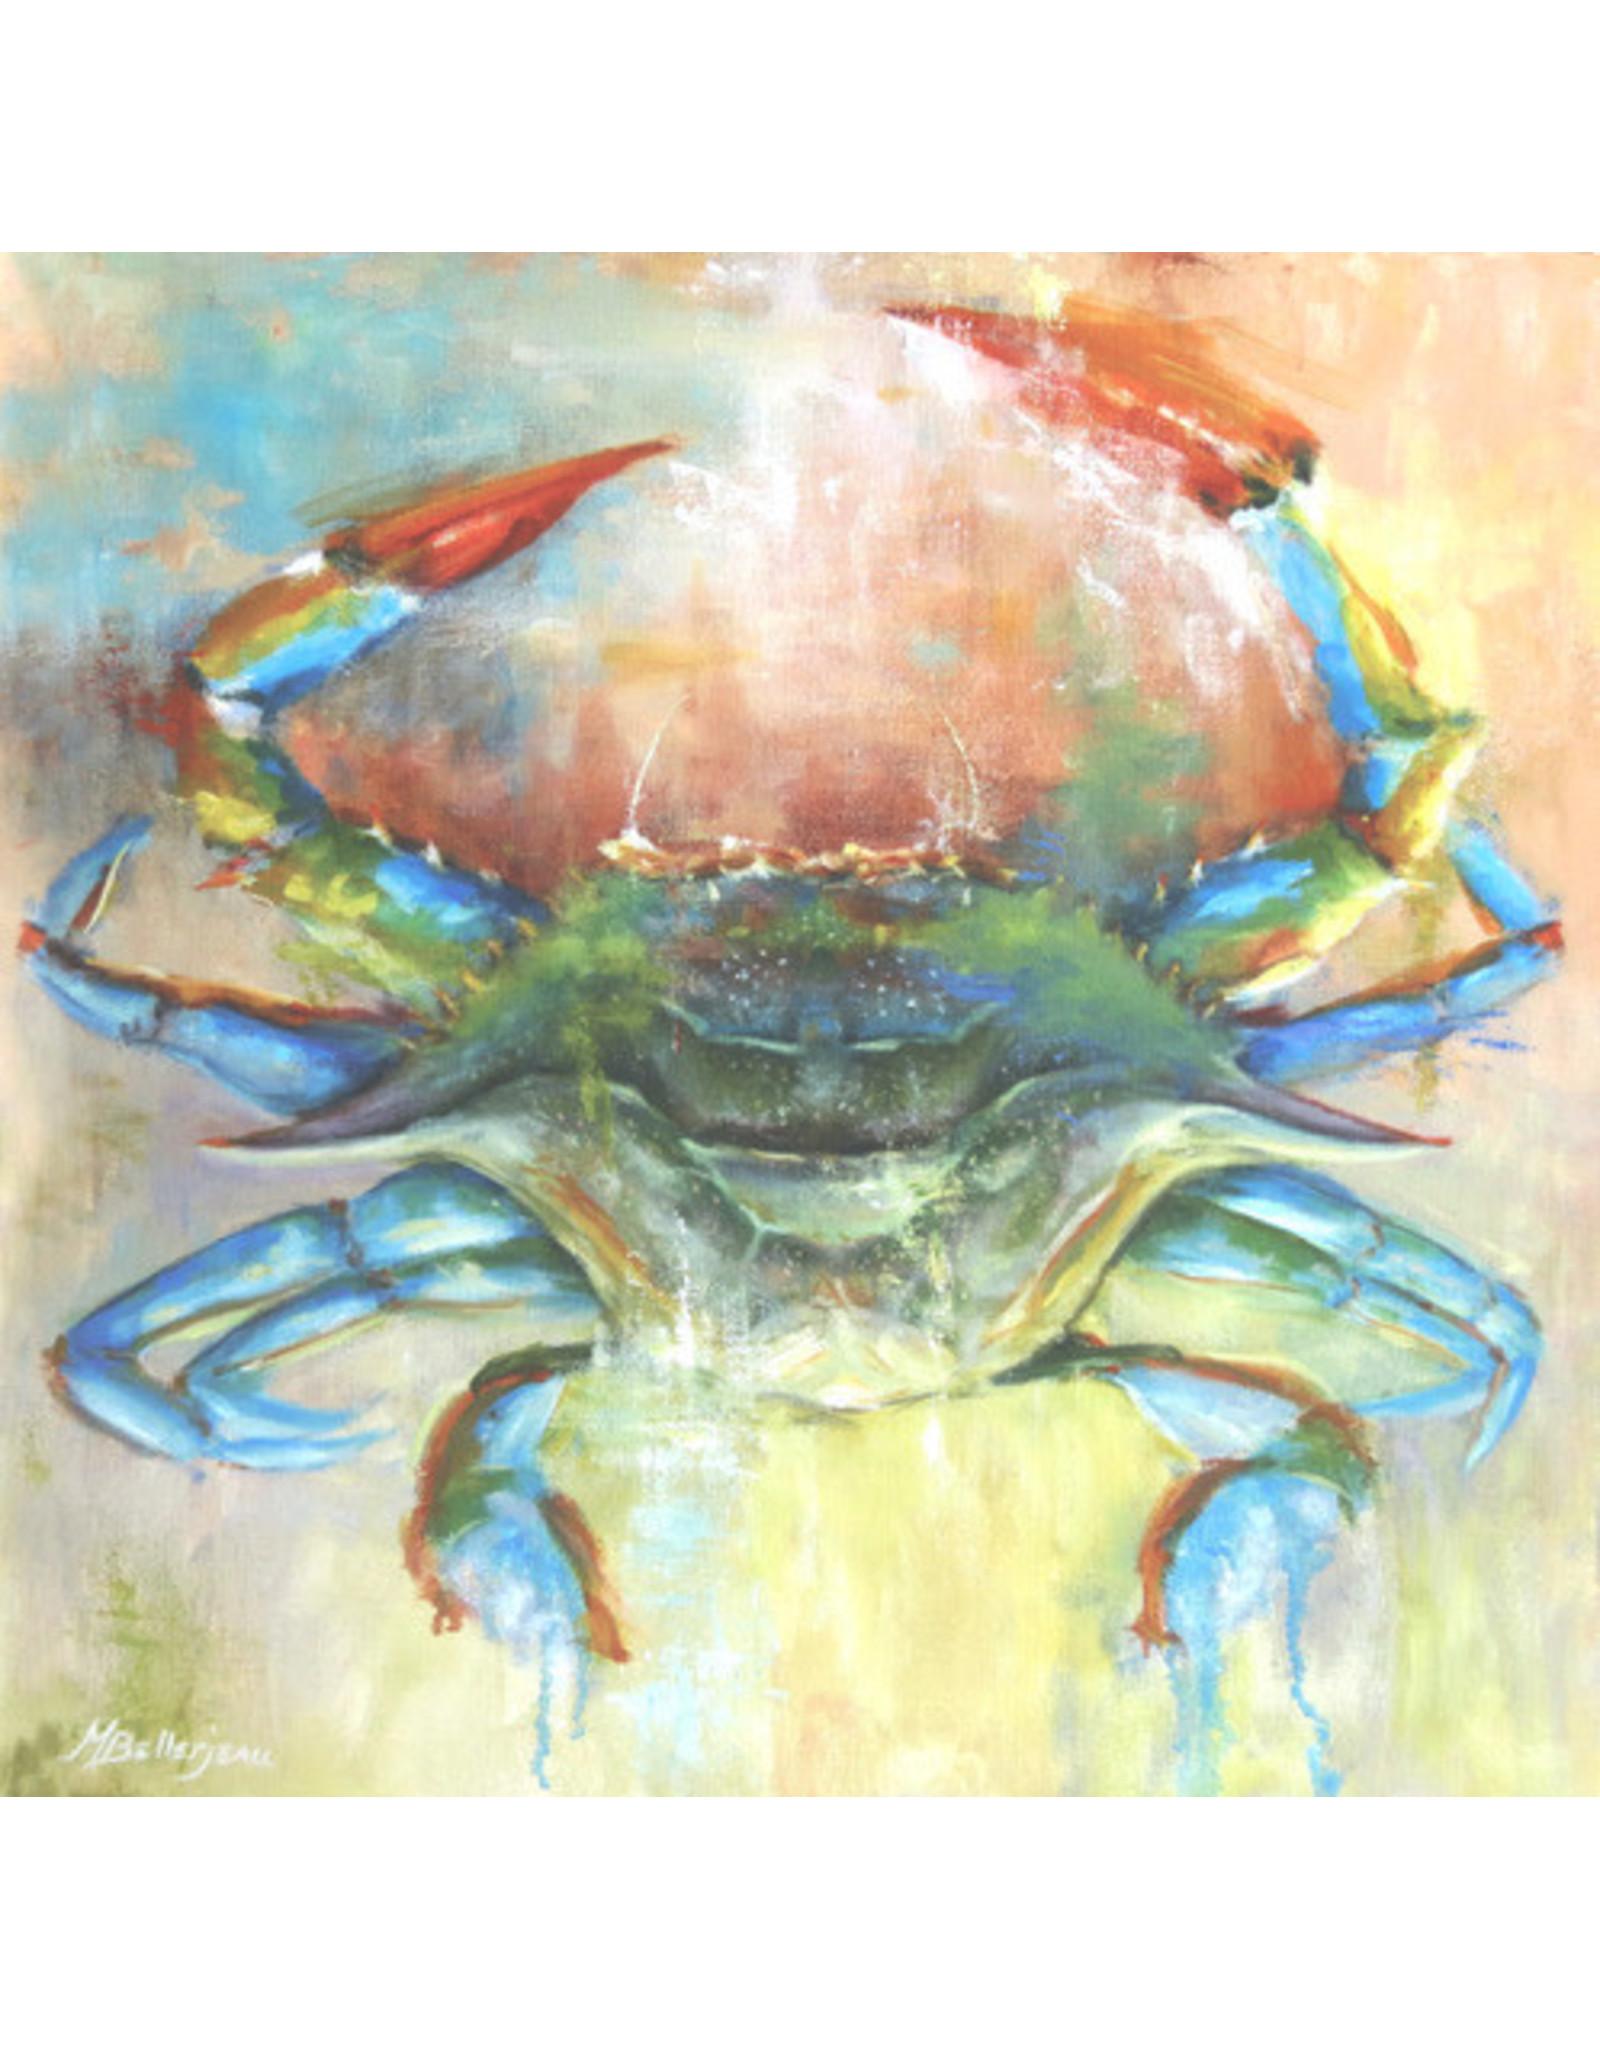 "Michaelann Bellerjeau COBALT CRAB, original oil on GW canvas, 20x20"", MICB"